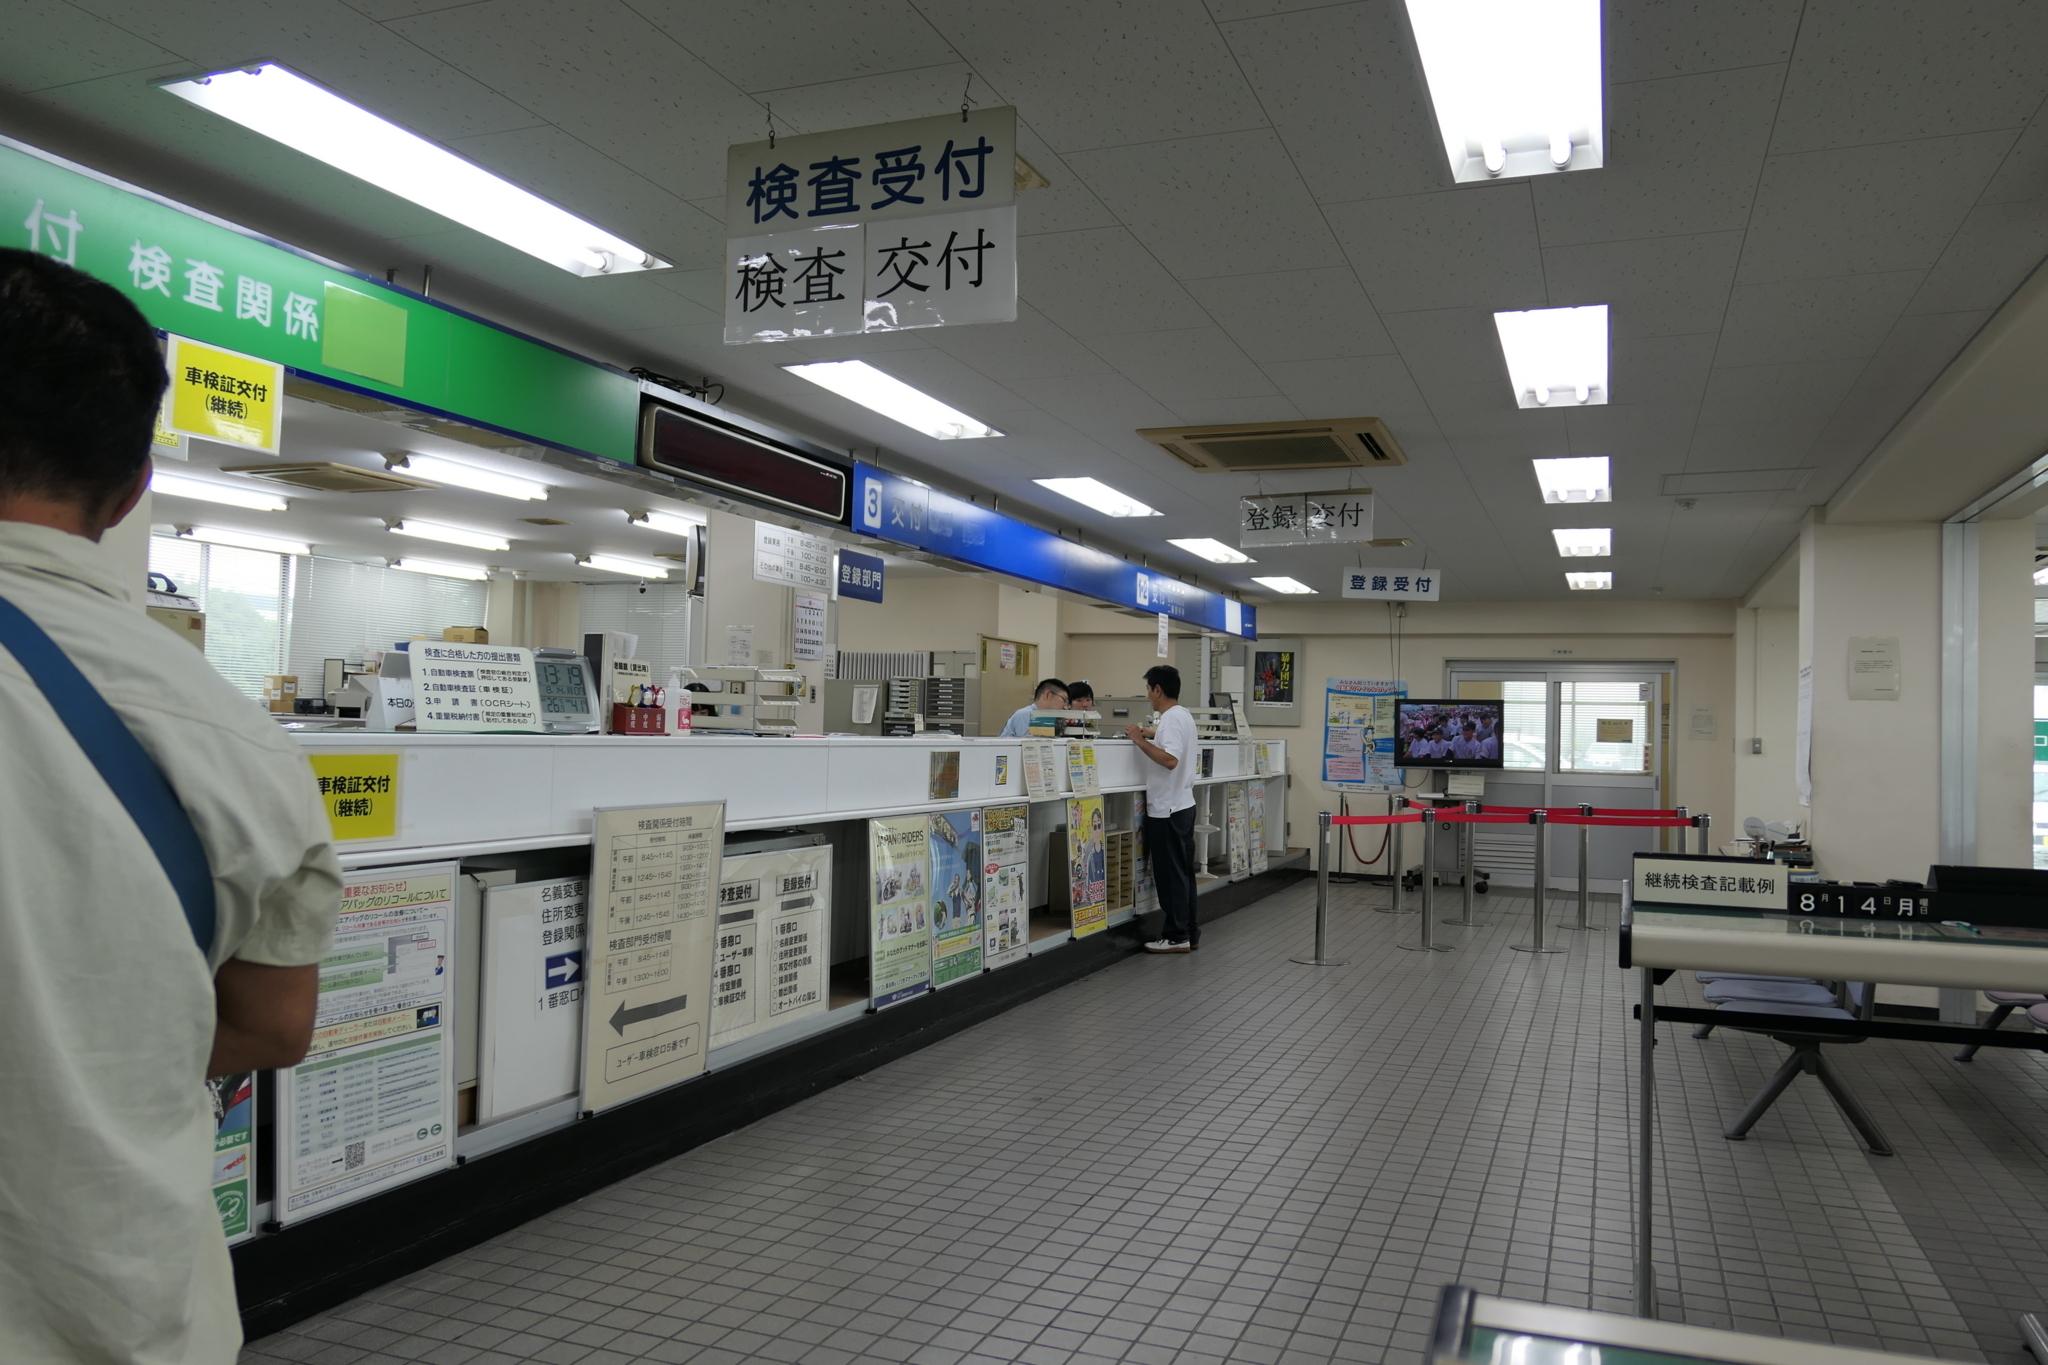 f:id:ToshUeno:20170814132034j:plain